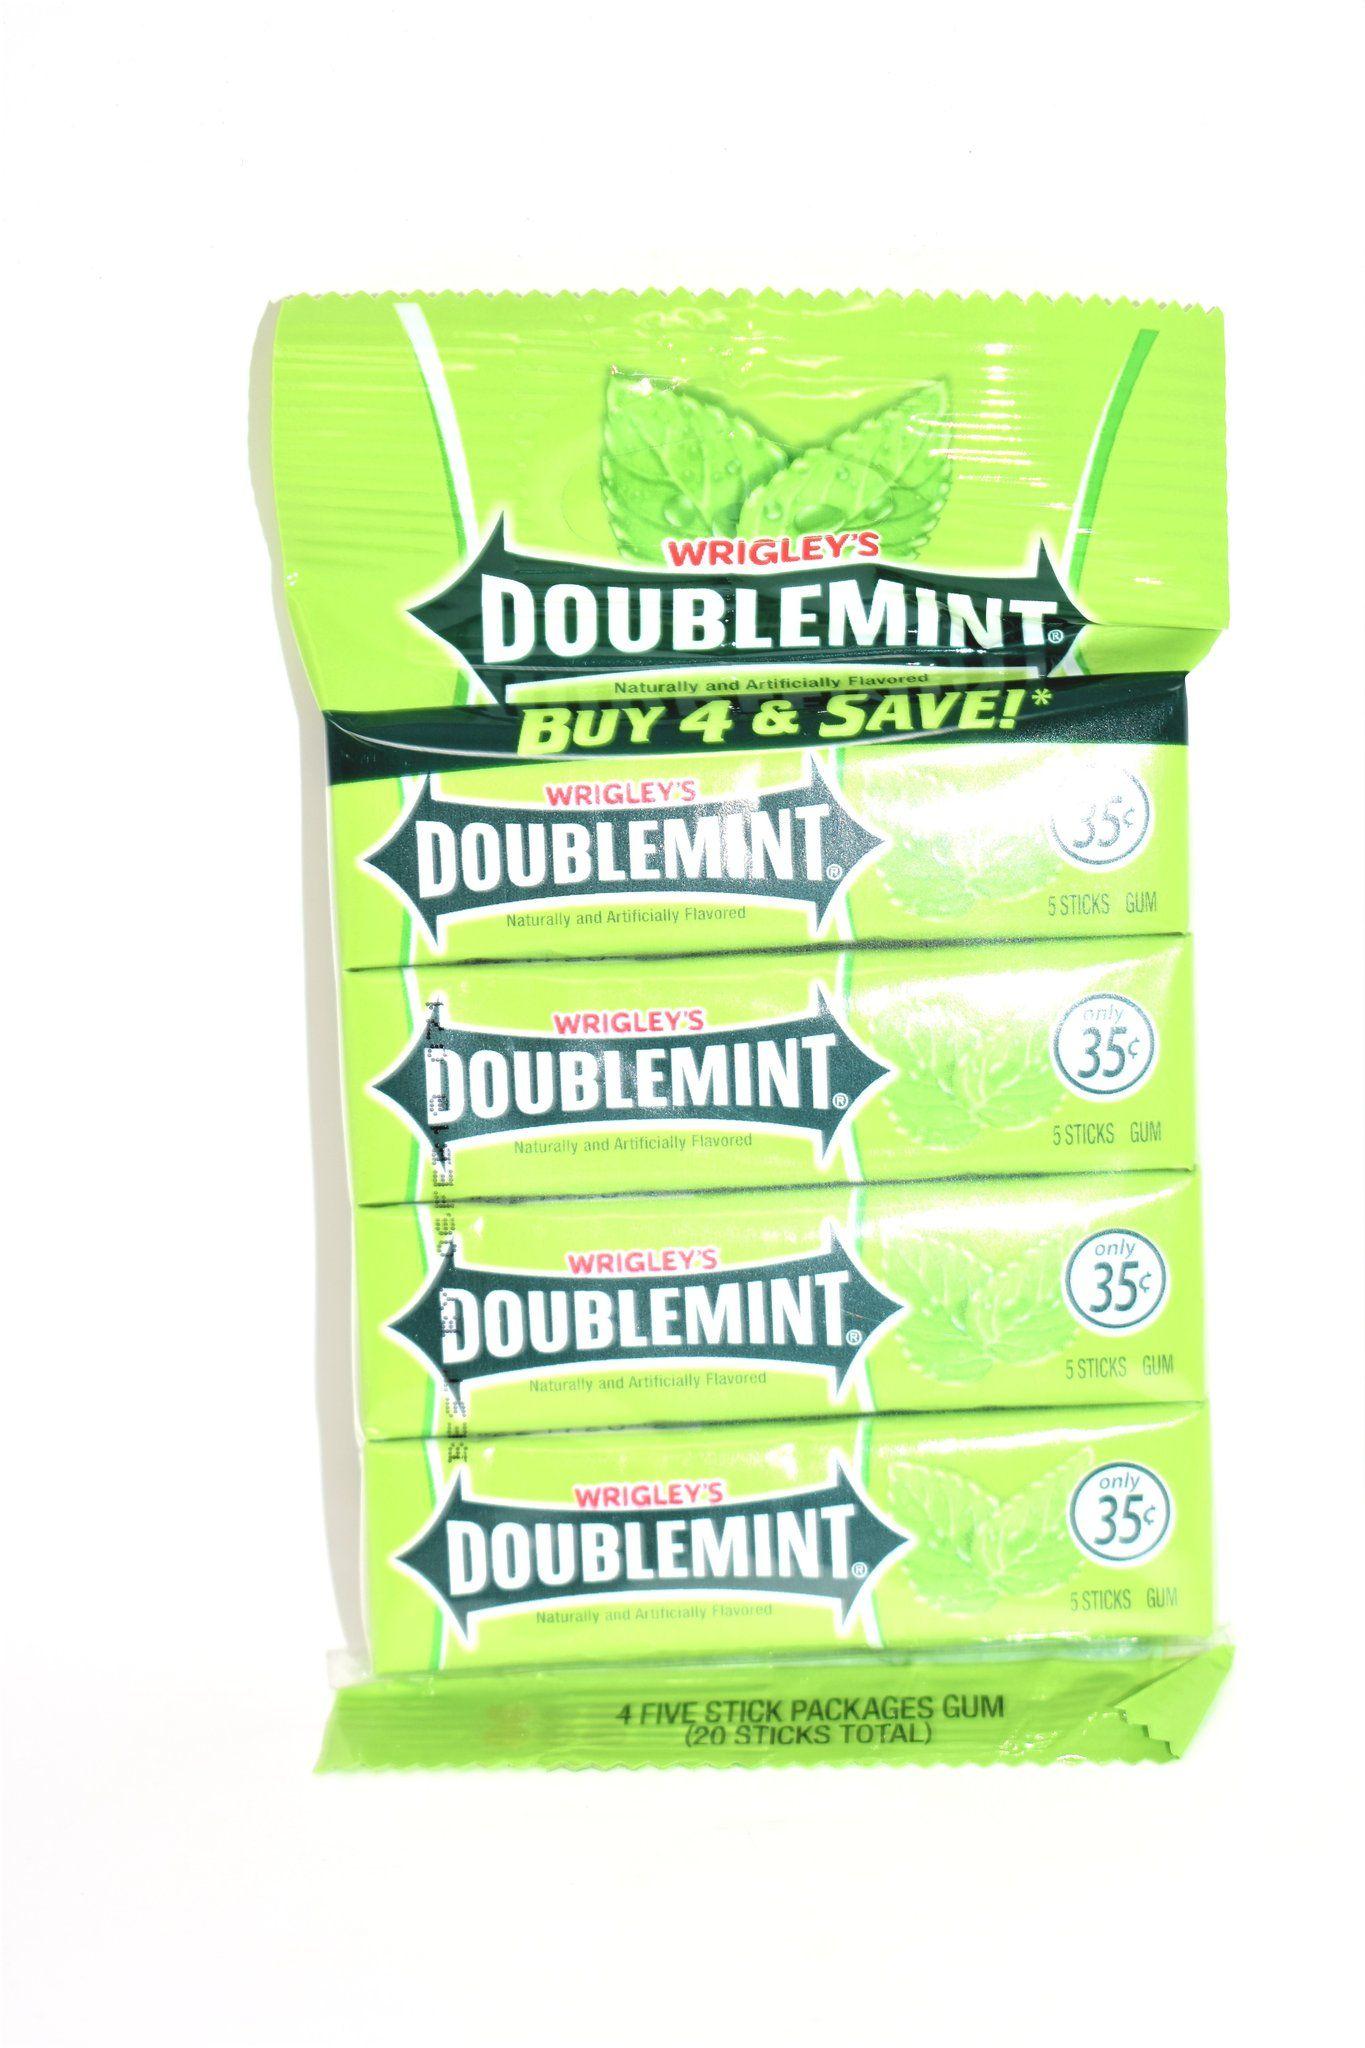 Wrigley S Doublemint Flavored Gum 20 Sticks Marketcol Gum Flavors Gum Chocolate Candy Brands